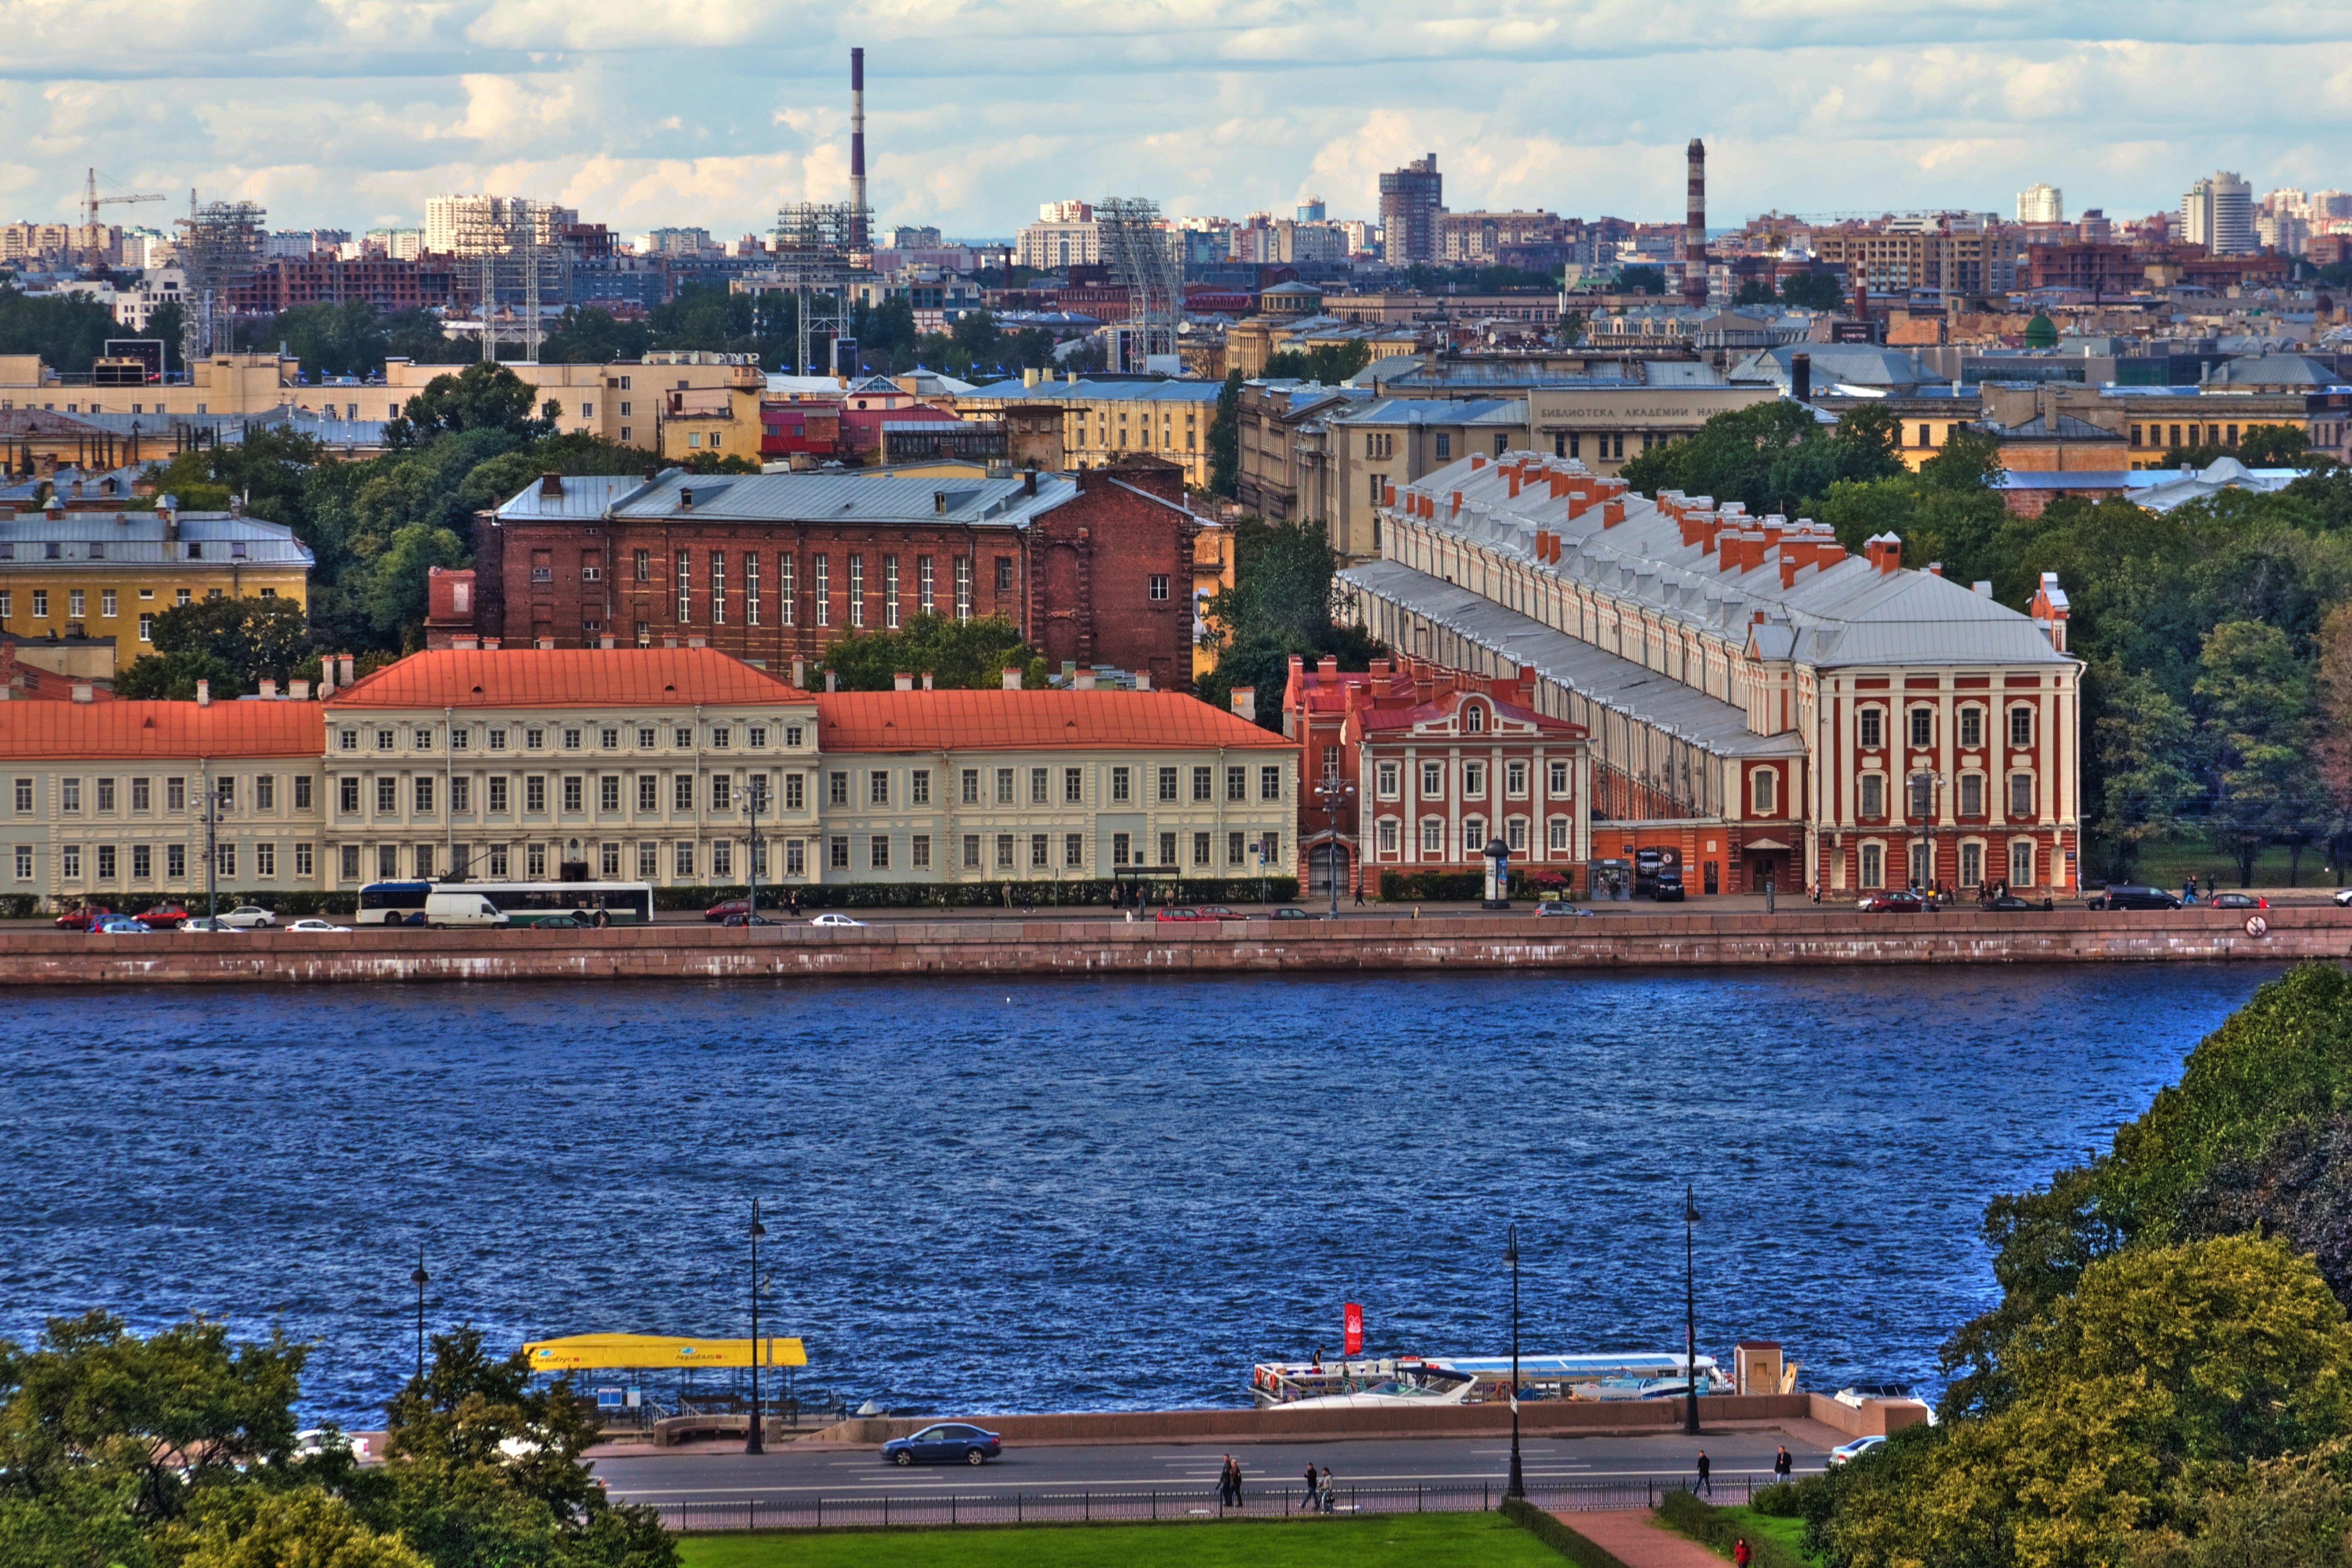 Building Saint Petersburg 5184x3456